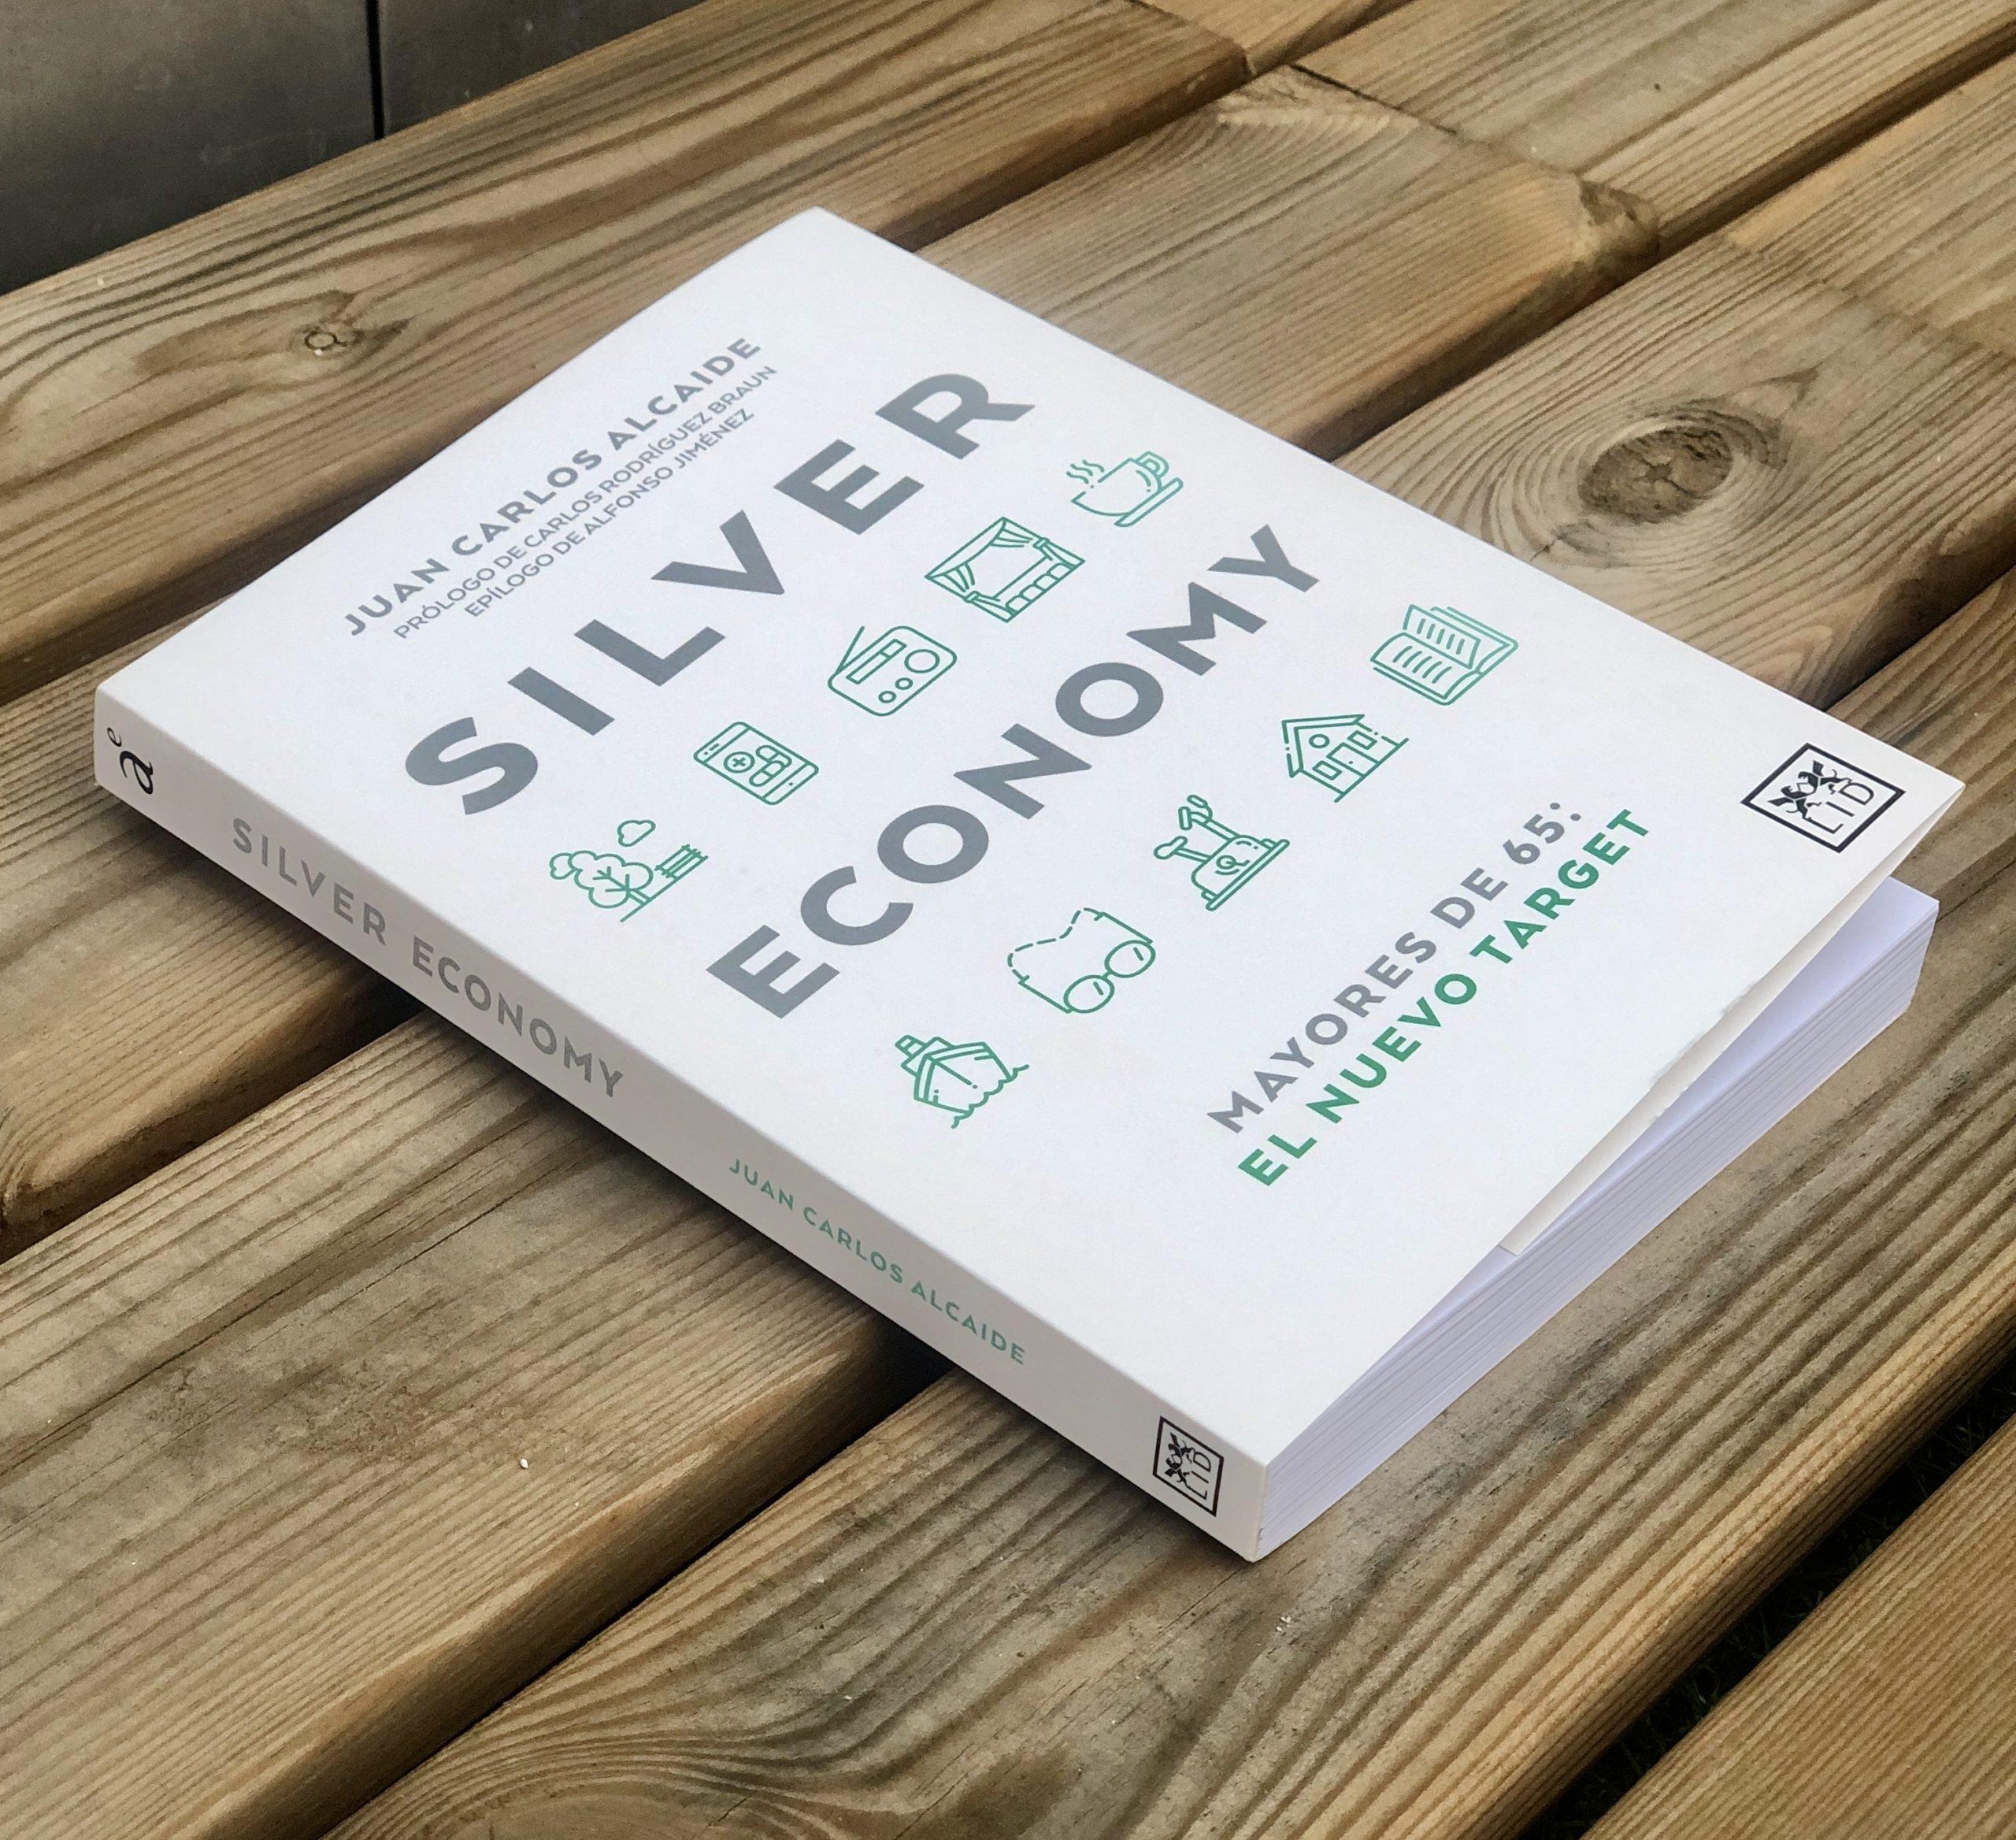 silver economy libro